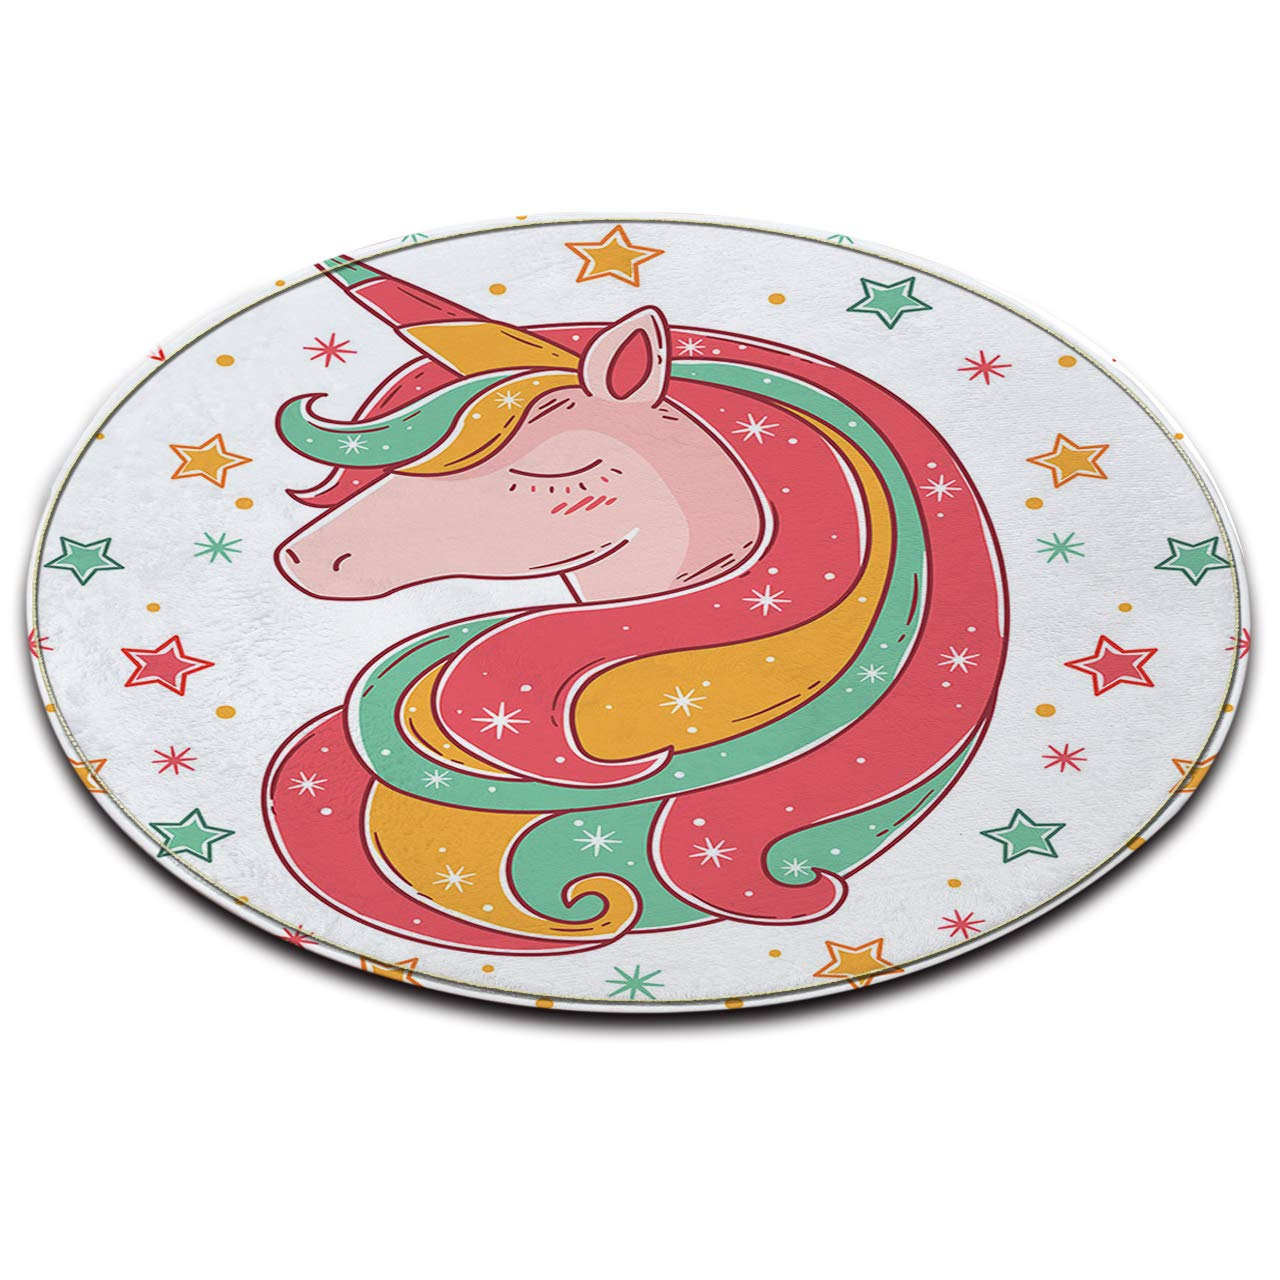 LB Round Area Rug Play Mat,Cartoon cute unicorn, Living Room Bedroom Bathroom Kitchen Children's/Baby's Room Soft Carpet Floor Mat Home Decor,60x60CM JinShiZhuan